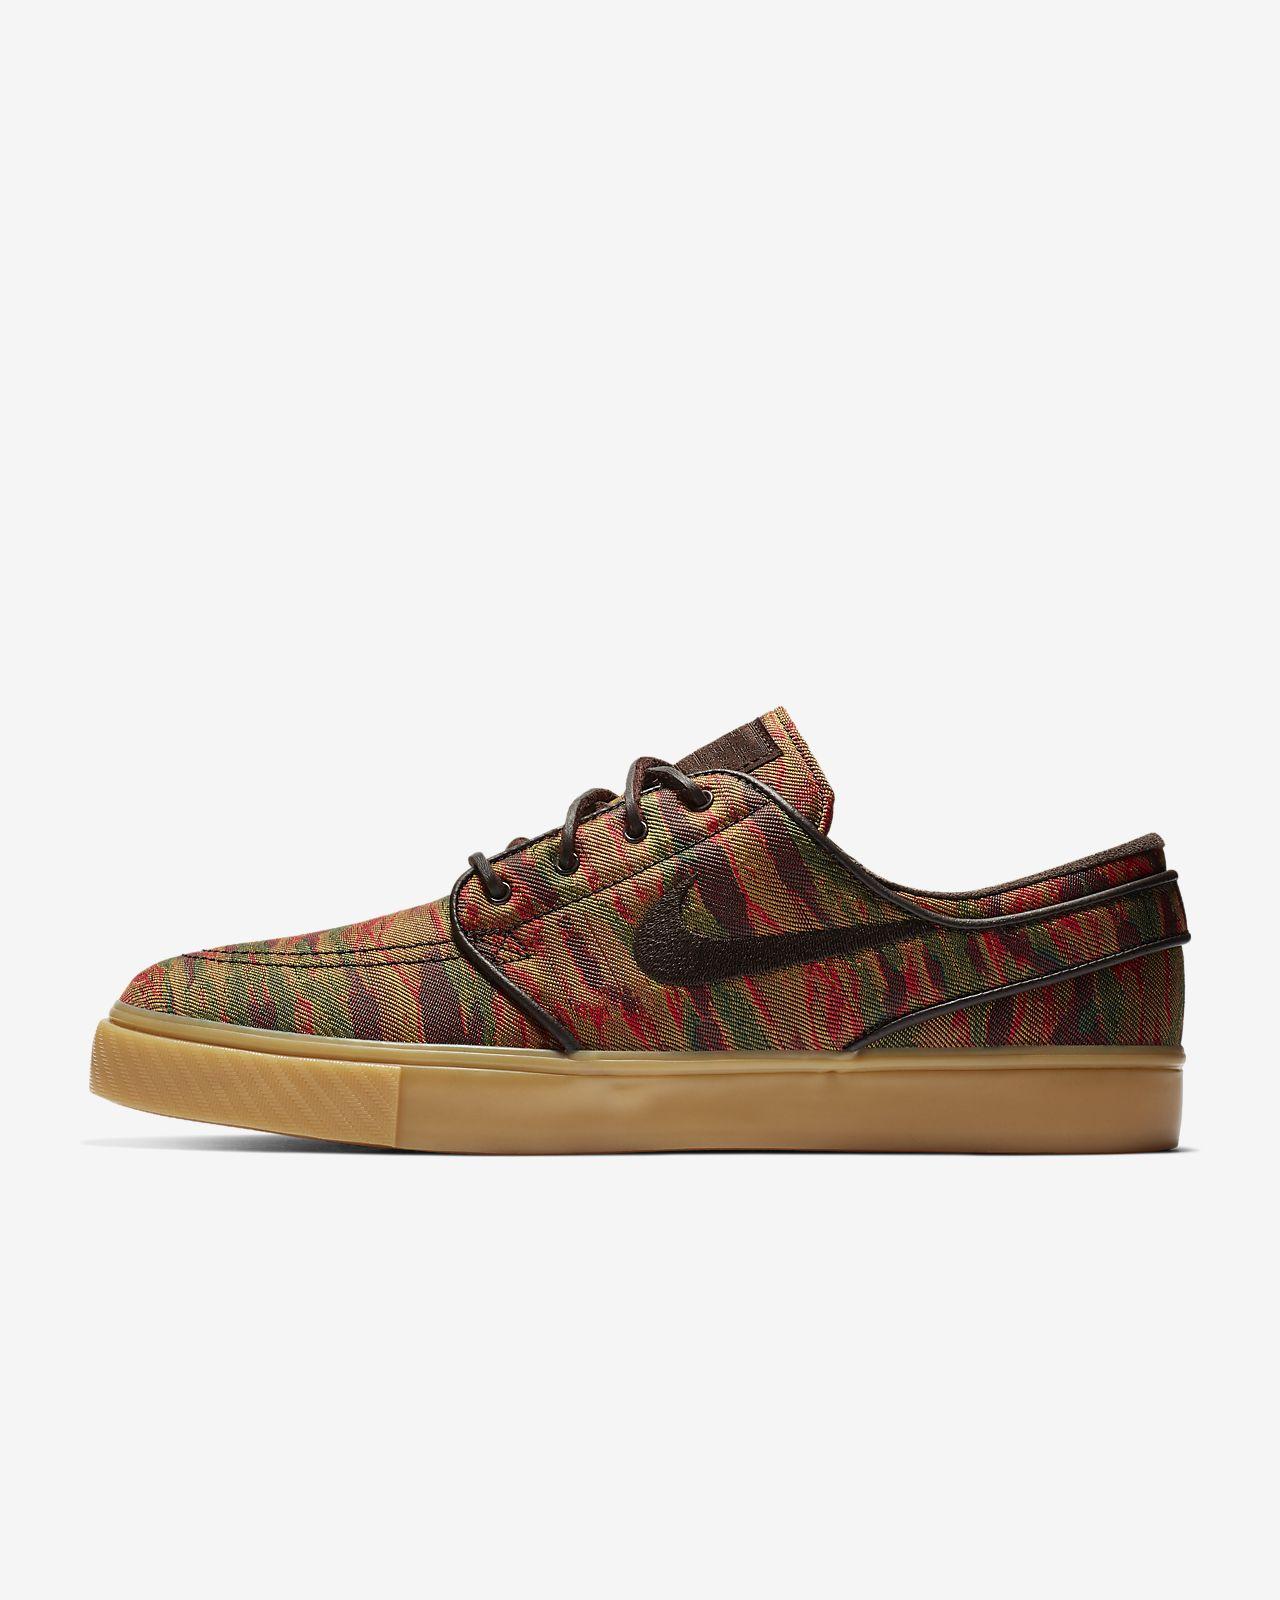 factory price 060df 619be ... Nike SB Zoom Stefan Janoski Canvas Premium Herren-Skateboardschuh